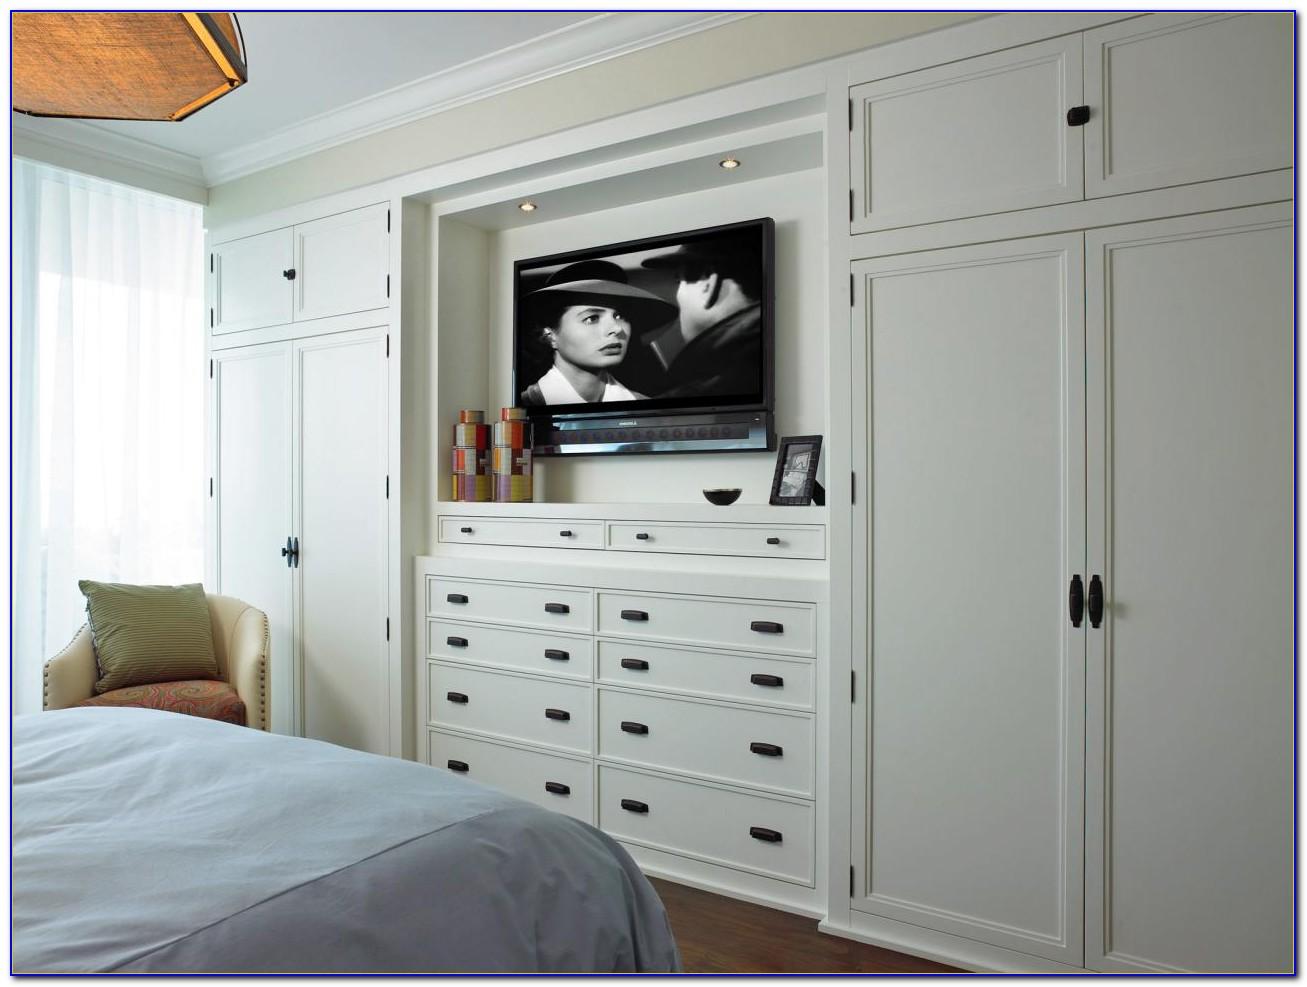 Storage Units For Children's Bedrooms